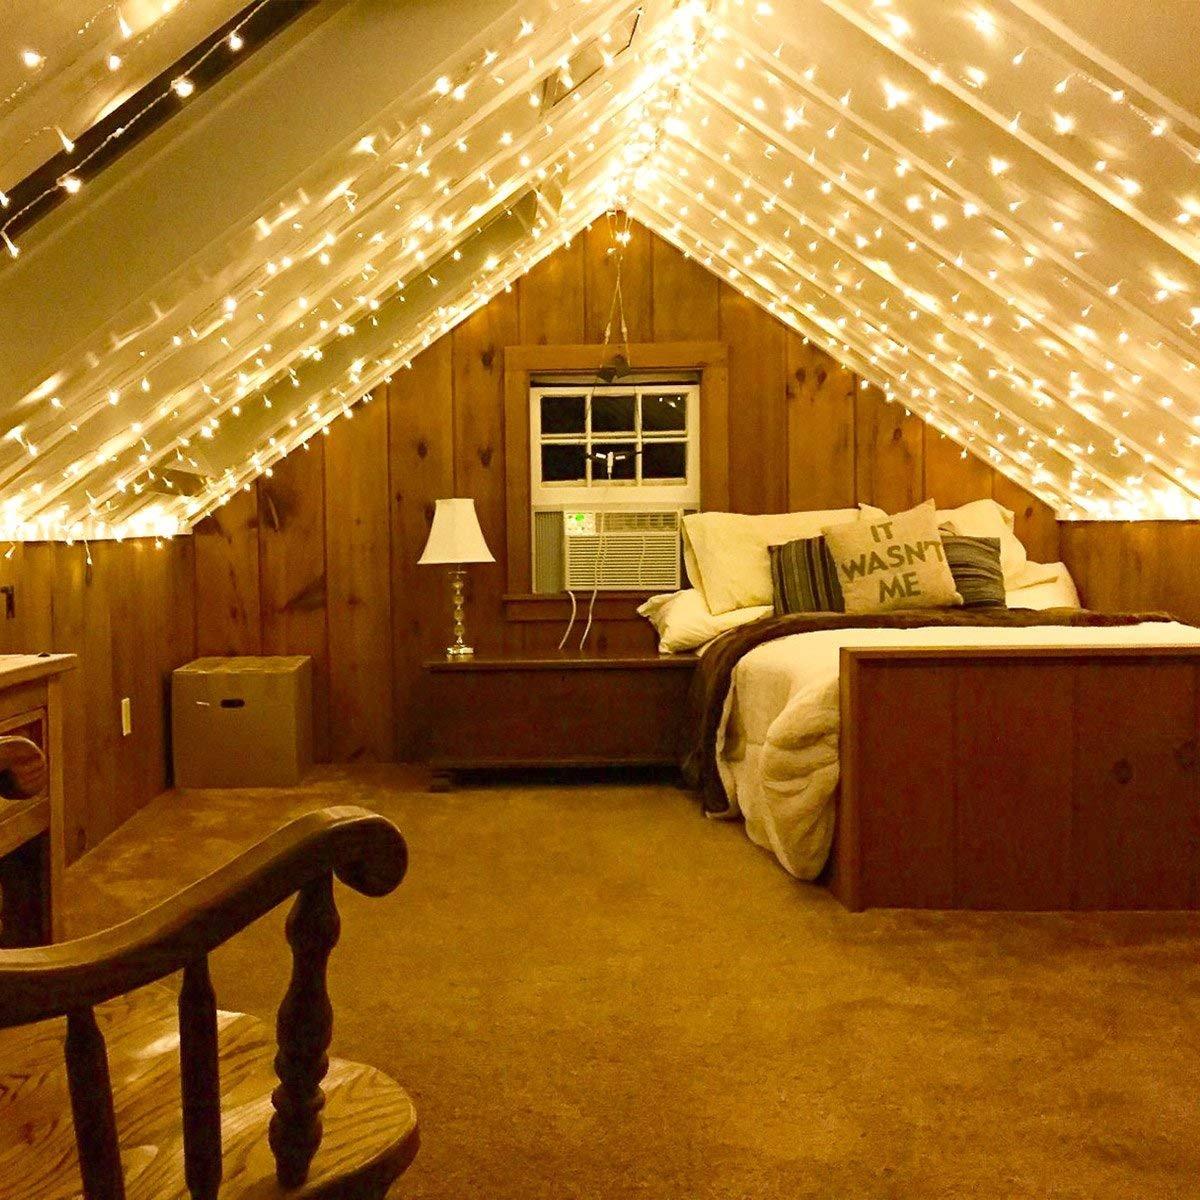 Lichternetz LED Lichterkettenvorhang 594 LEDs Sternnetz Warmwei/ß 8 Modi 3m x 6m Sternen LED Lichterketten Lighting EVER LE Lichterkette